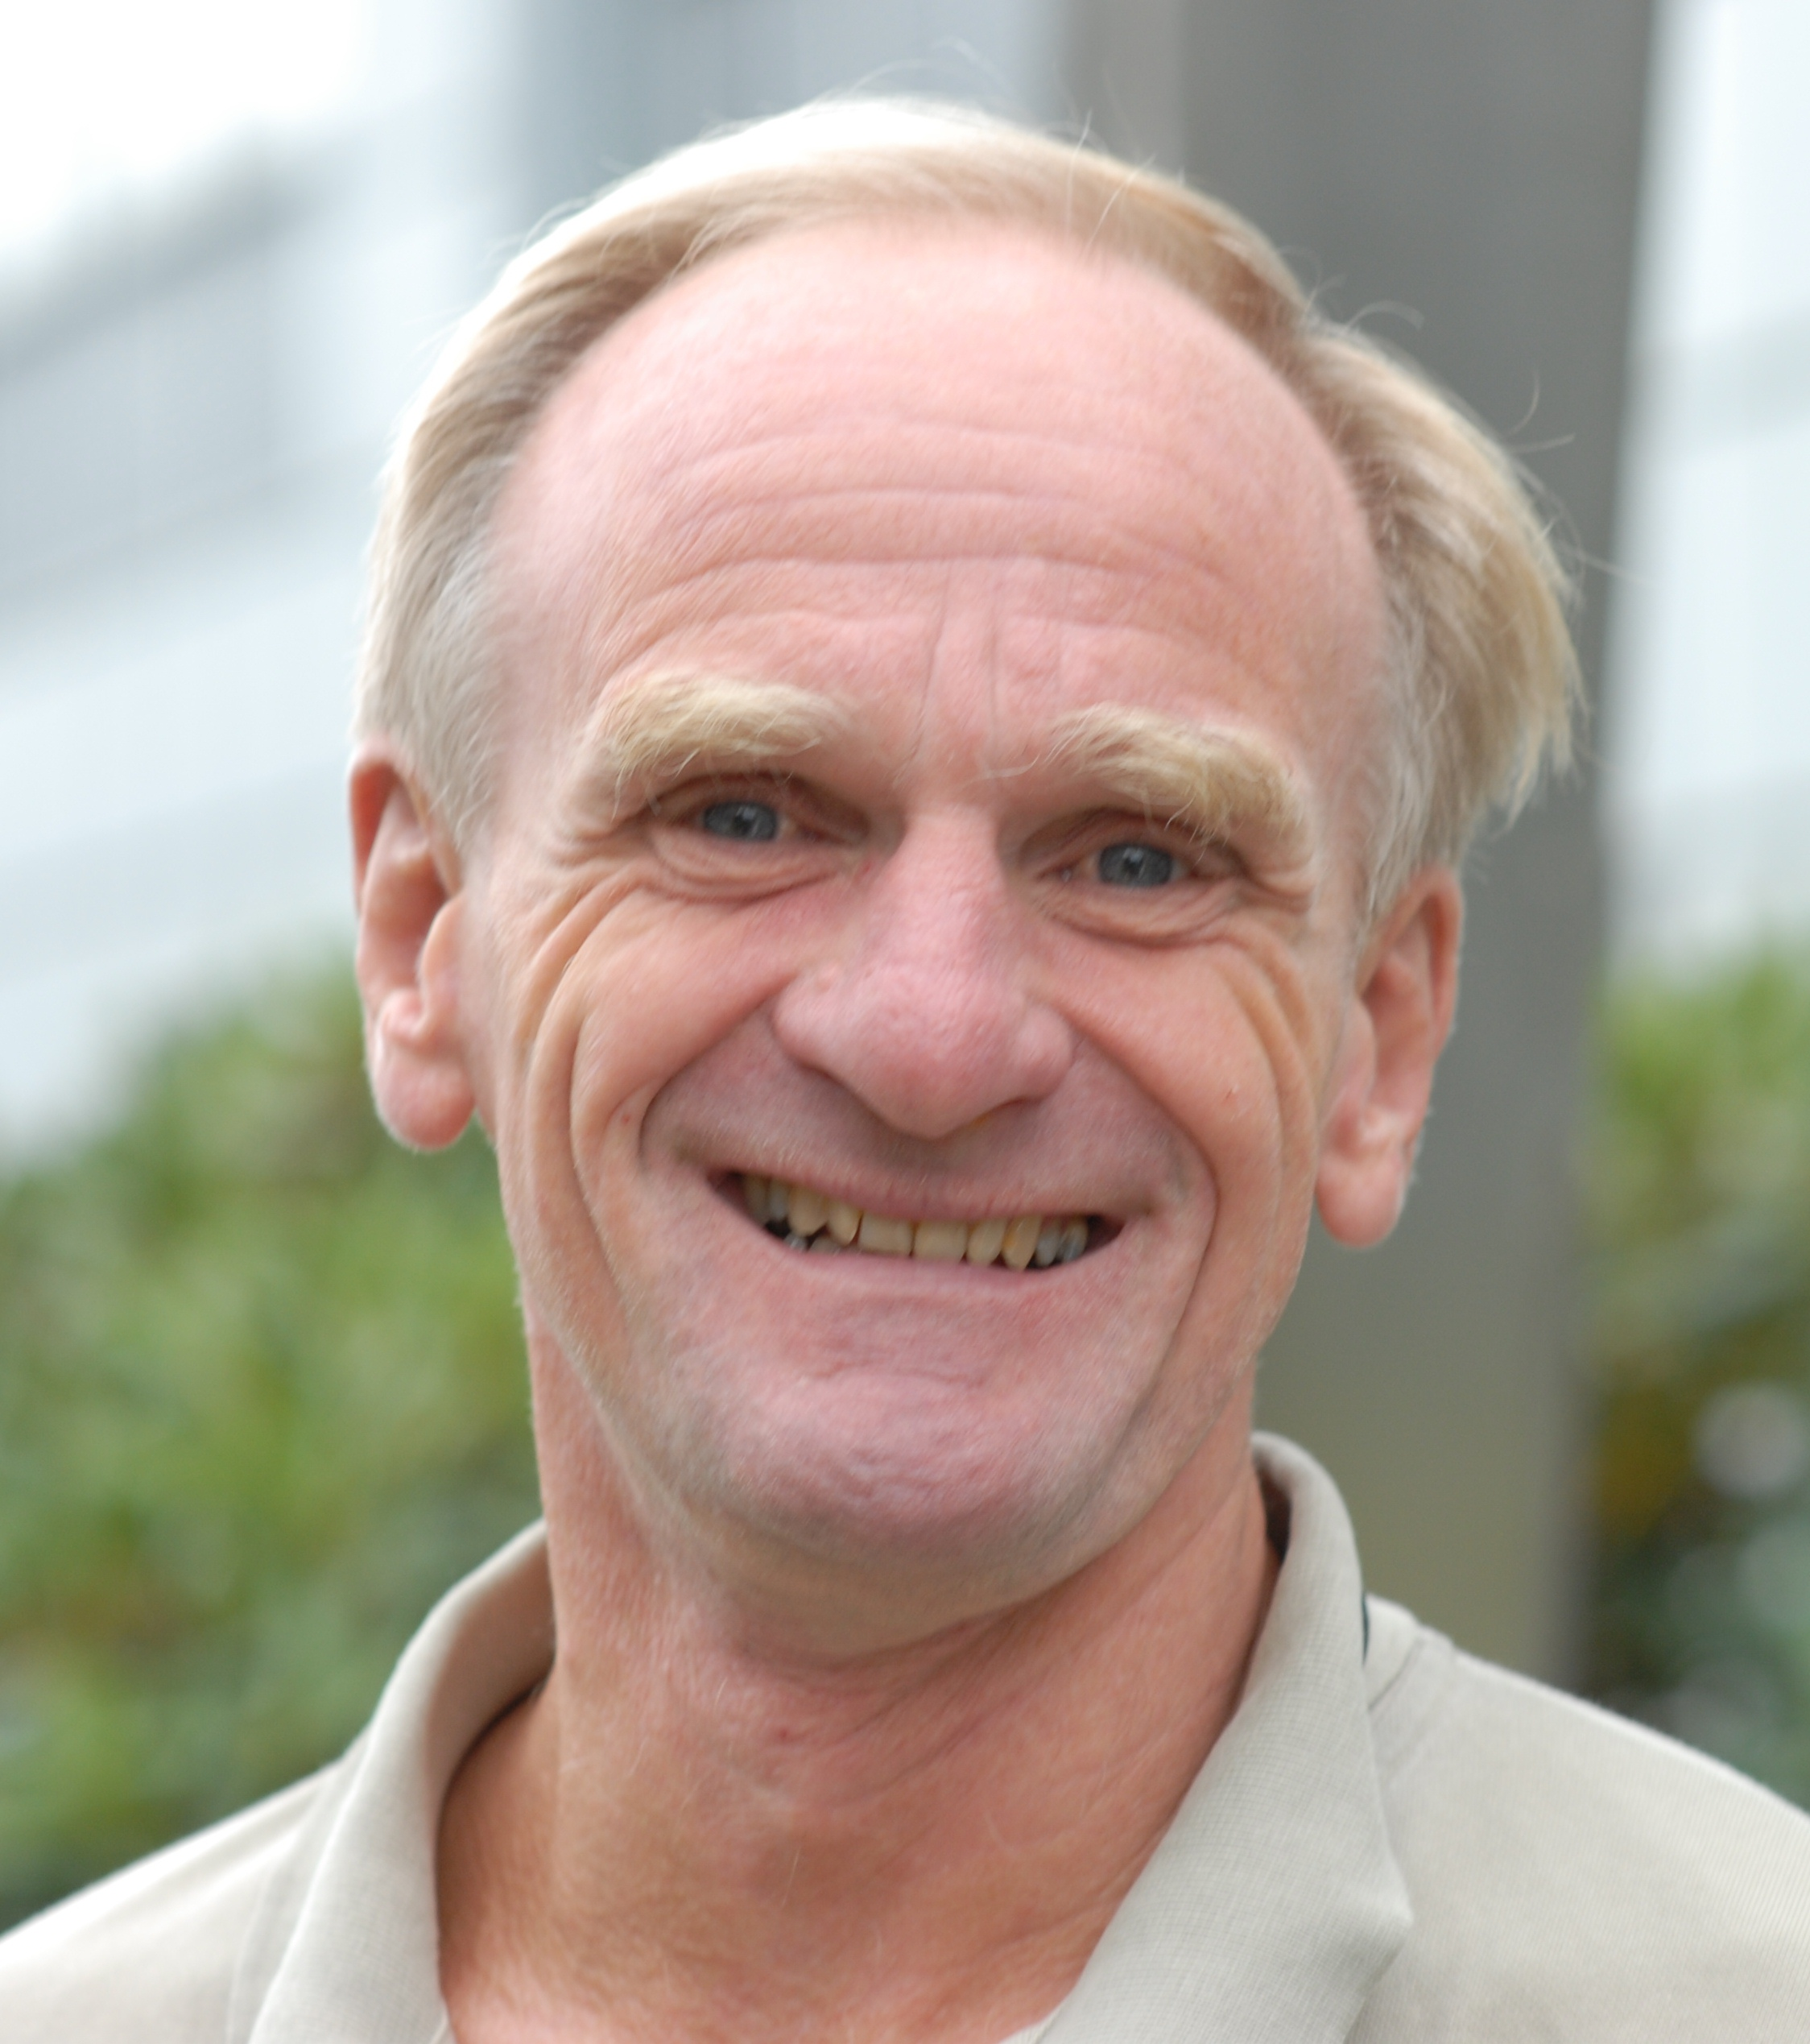 Finn Gunnar Nielsens bilde